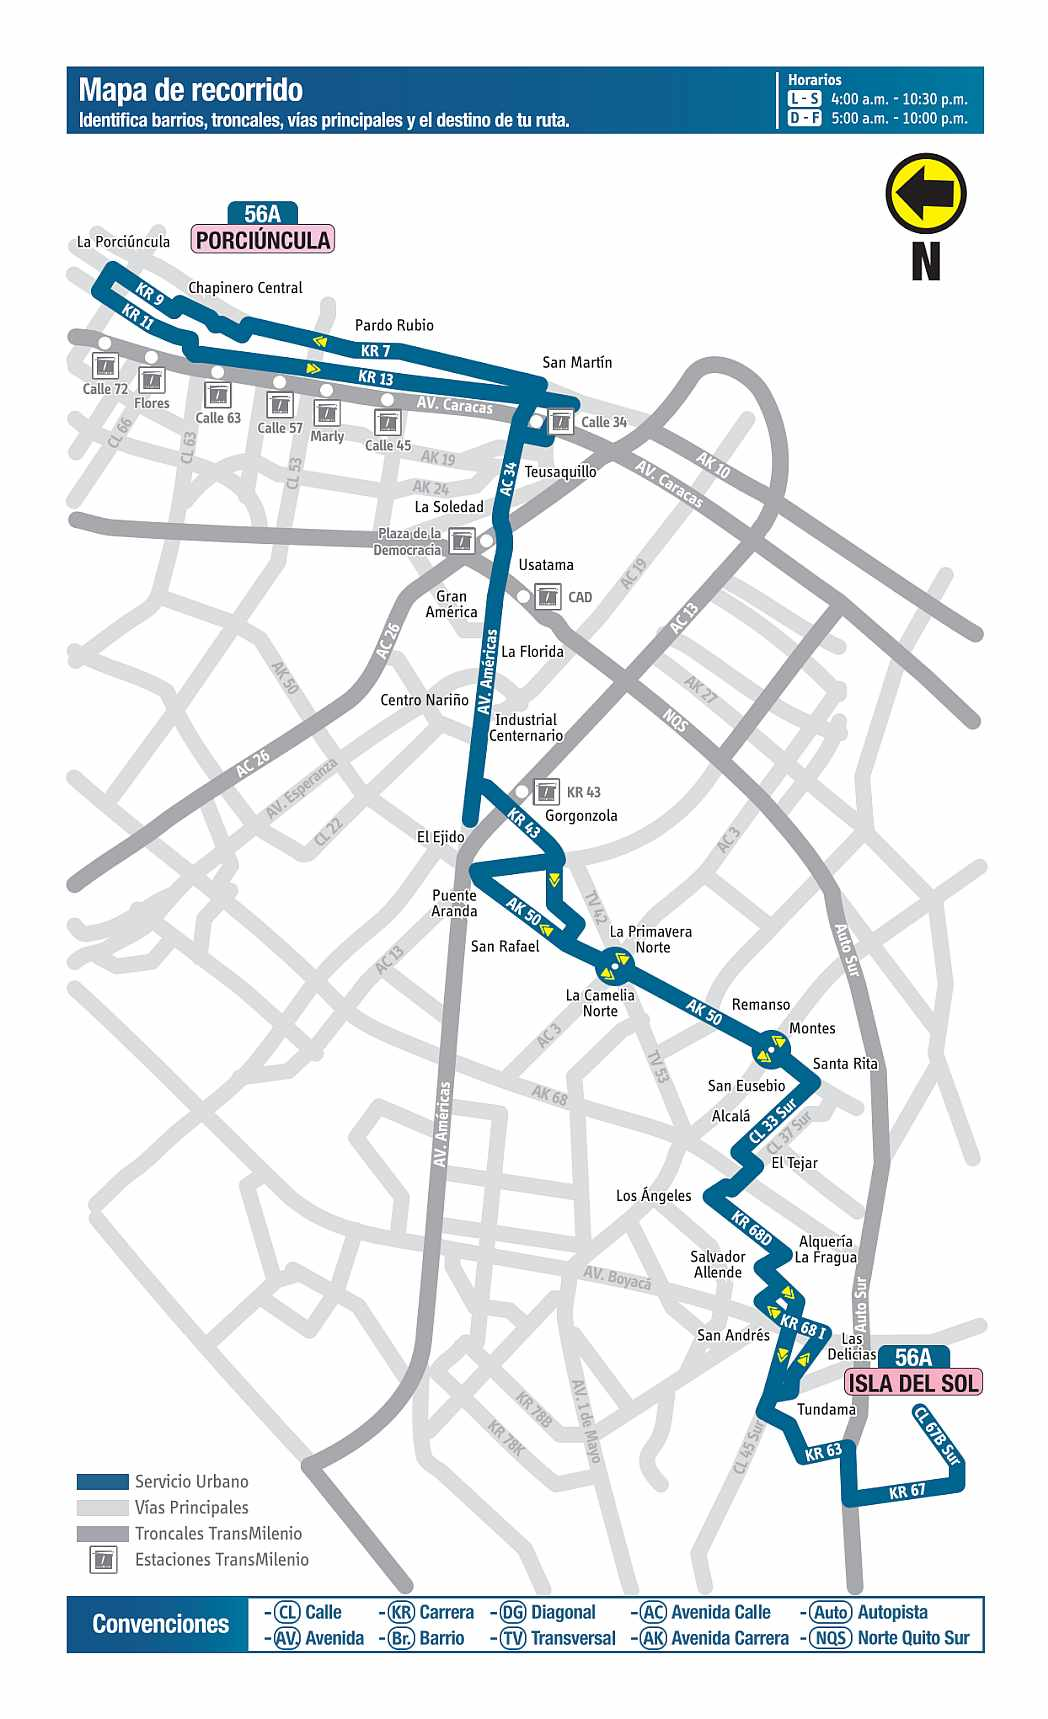 Mapa bus urbano: 56A Isla del Sol - Porciúncula